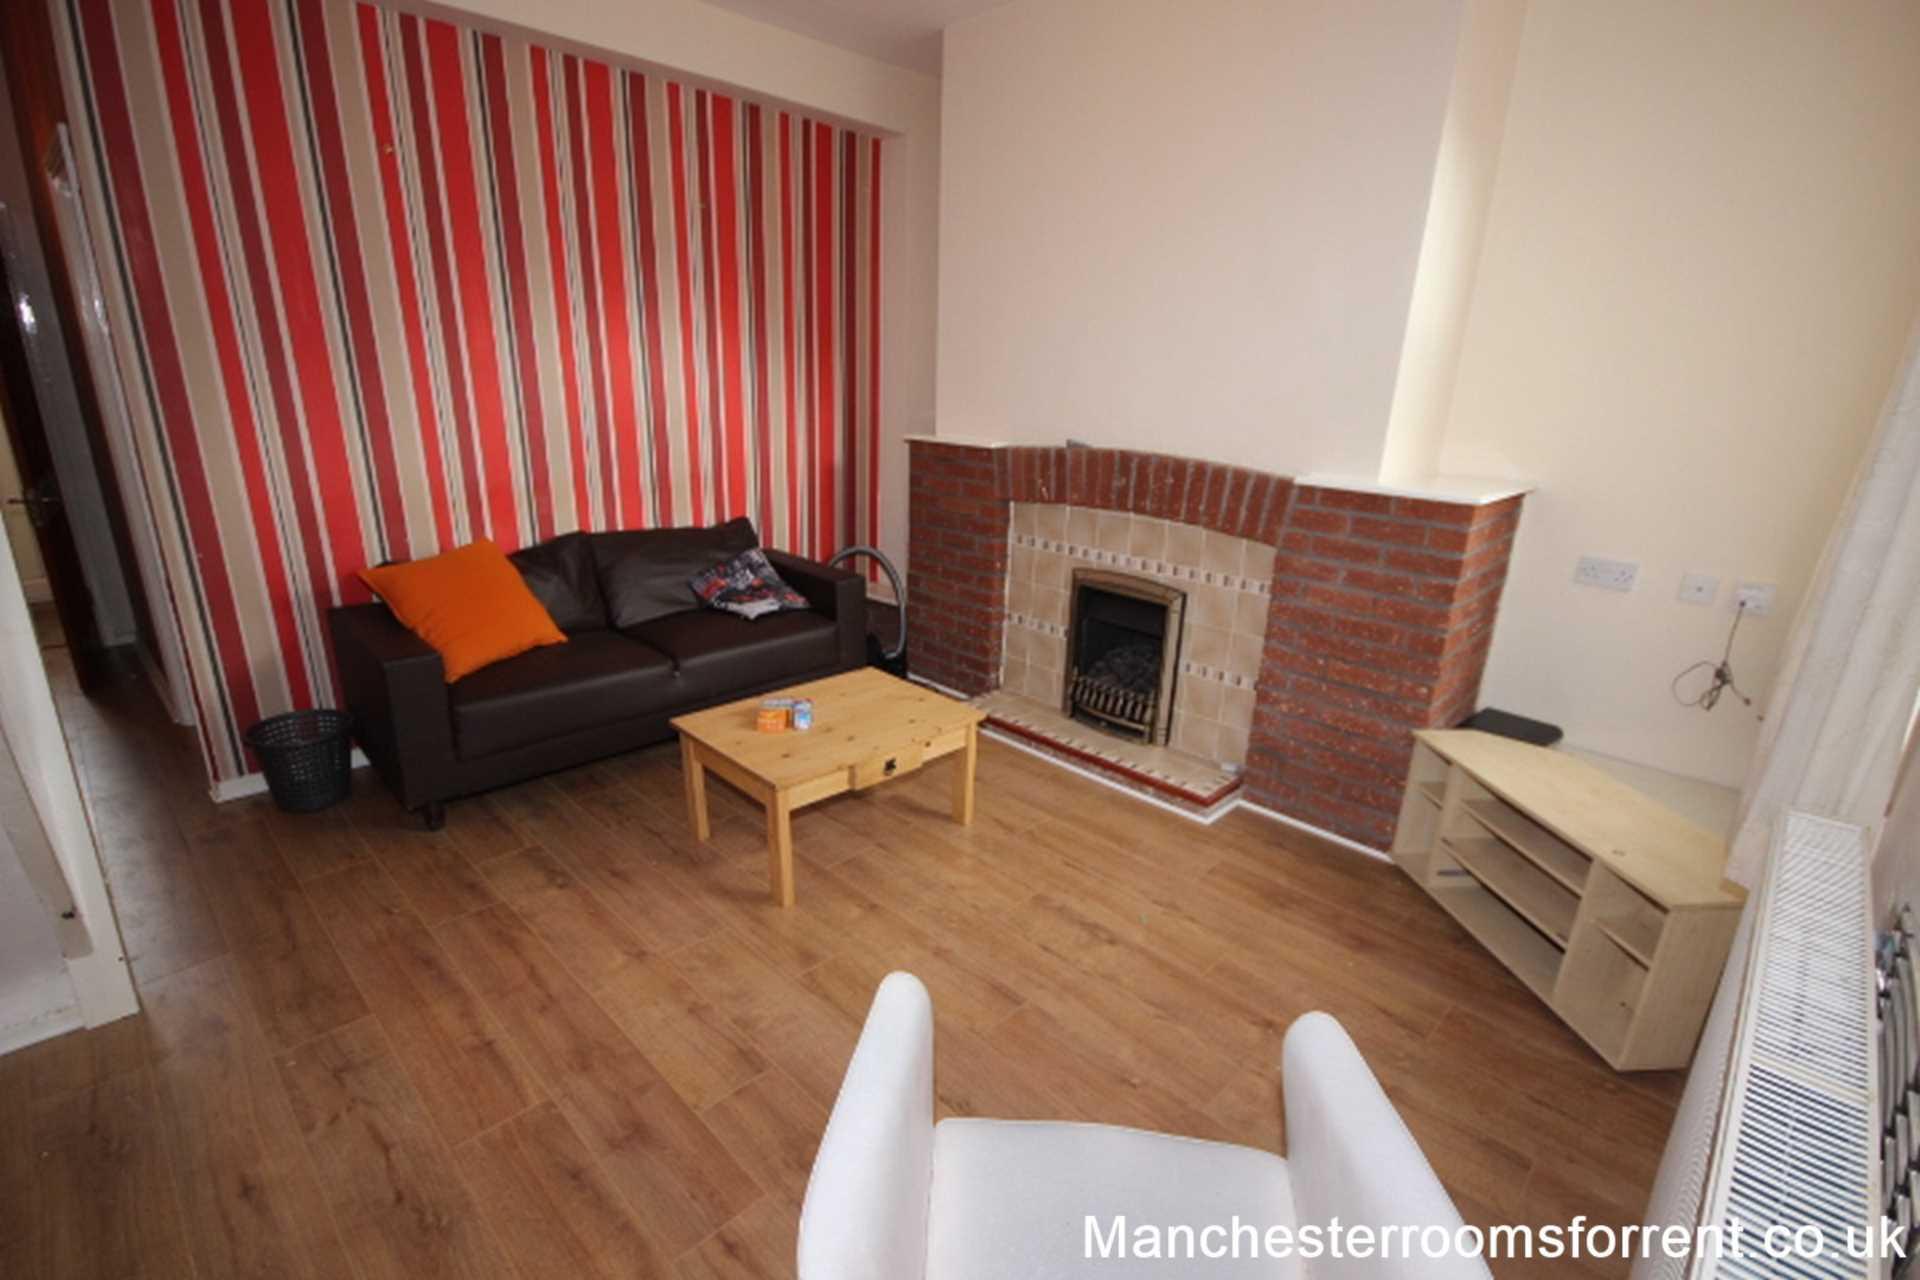 Piccadilly Property Management Ltd - 4 Bedroom House, Gascoyne Street, Rusholme, Manchester M14 4FU